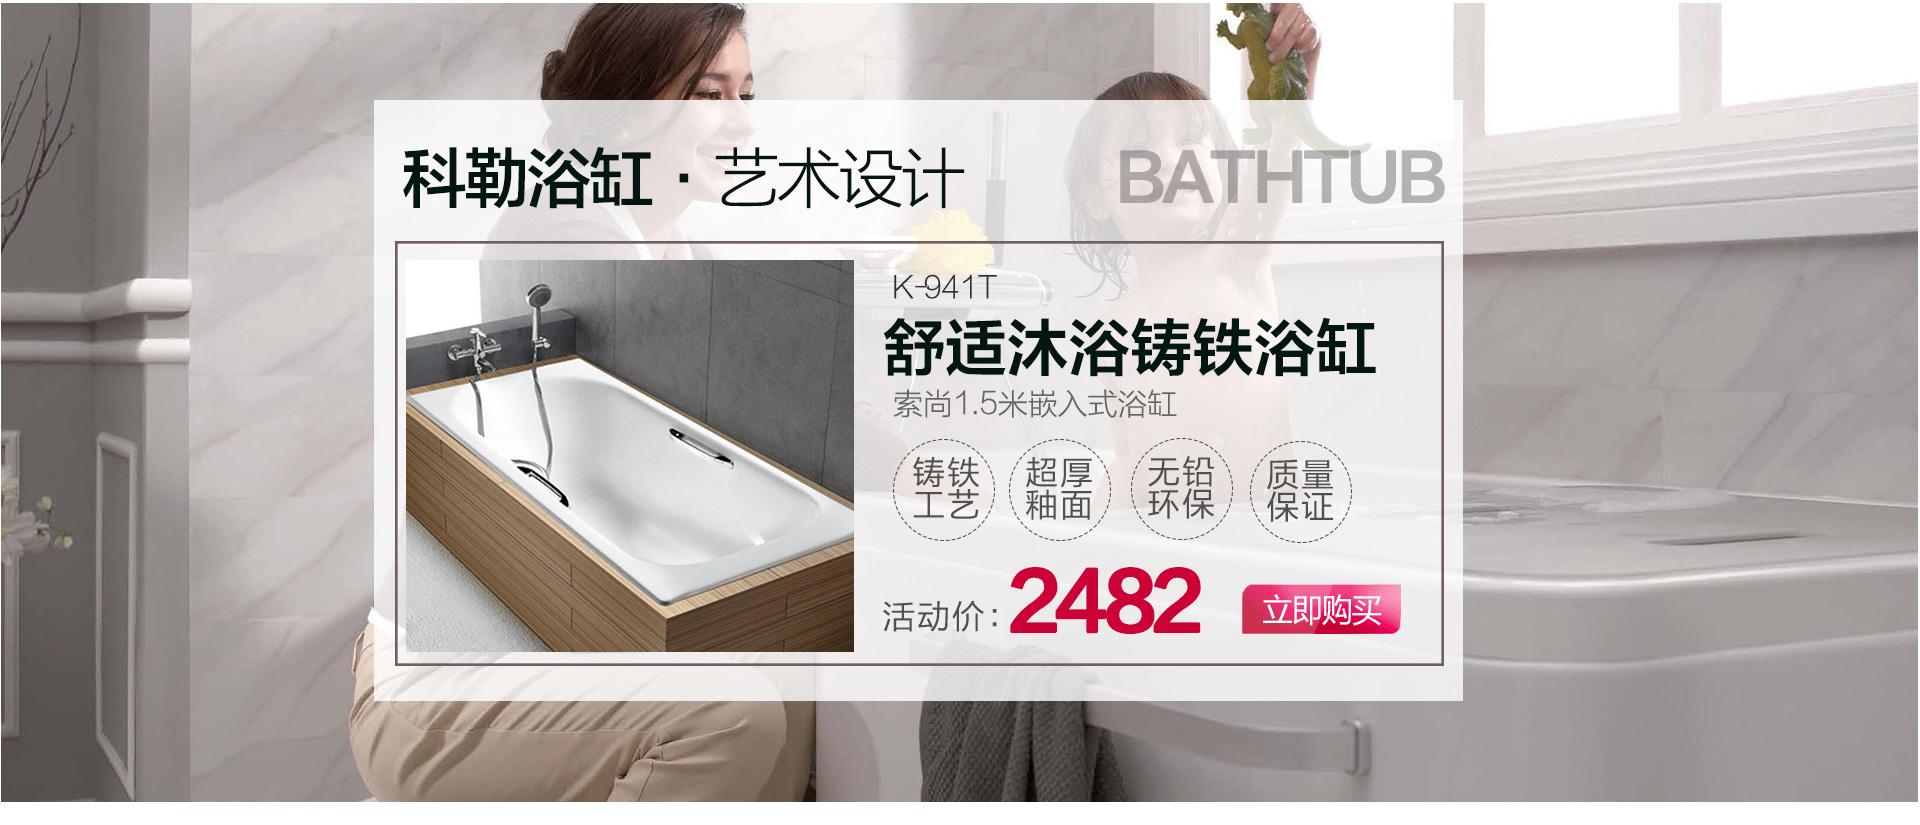 single bowl cast iron kitchen sink cost to redo 科勒金屋专卖店 - 京东